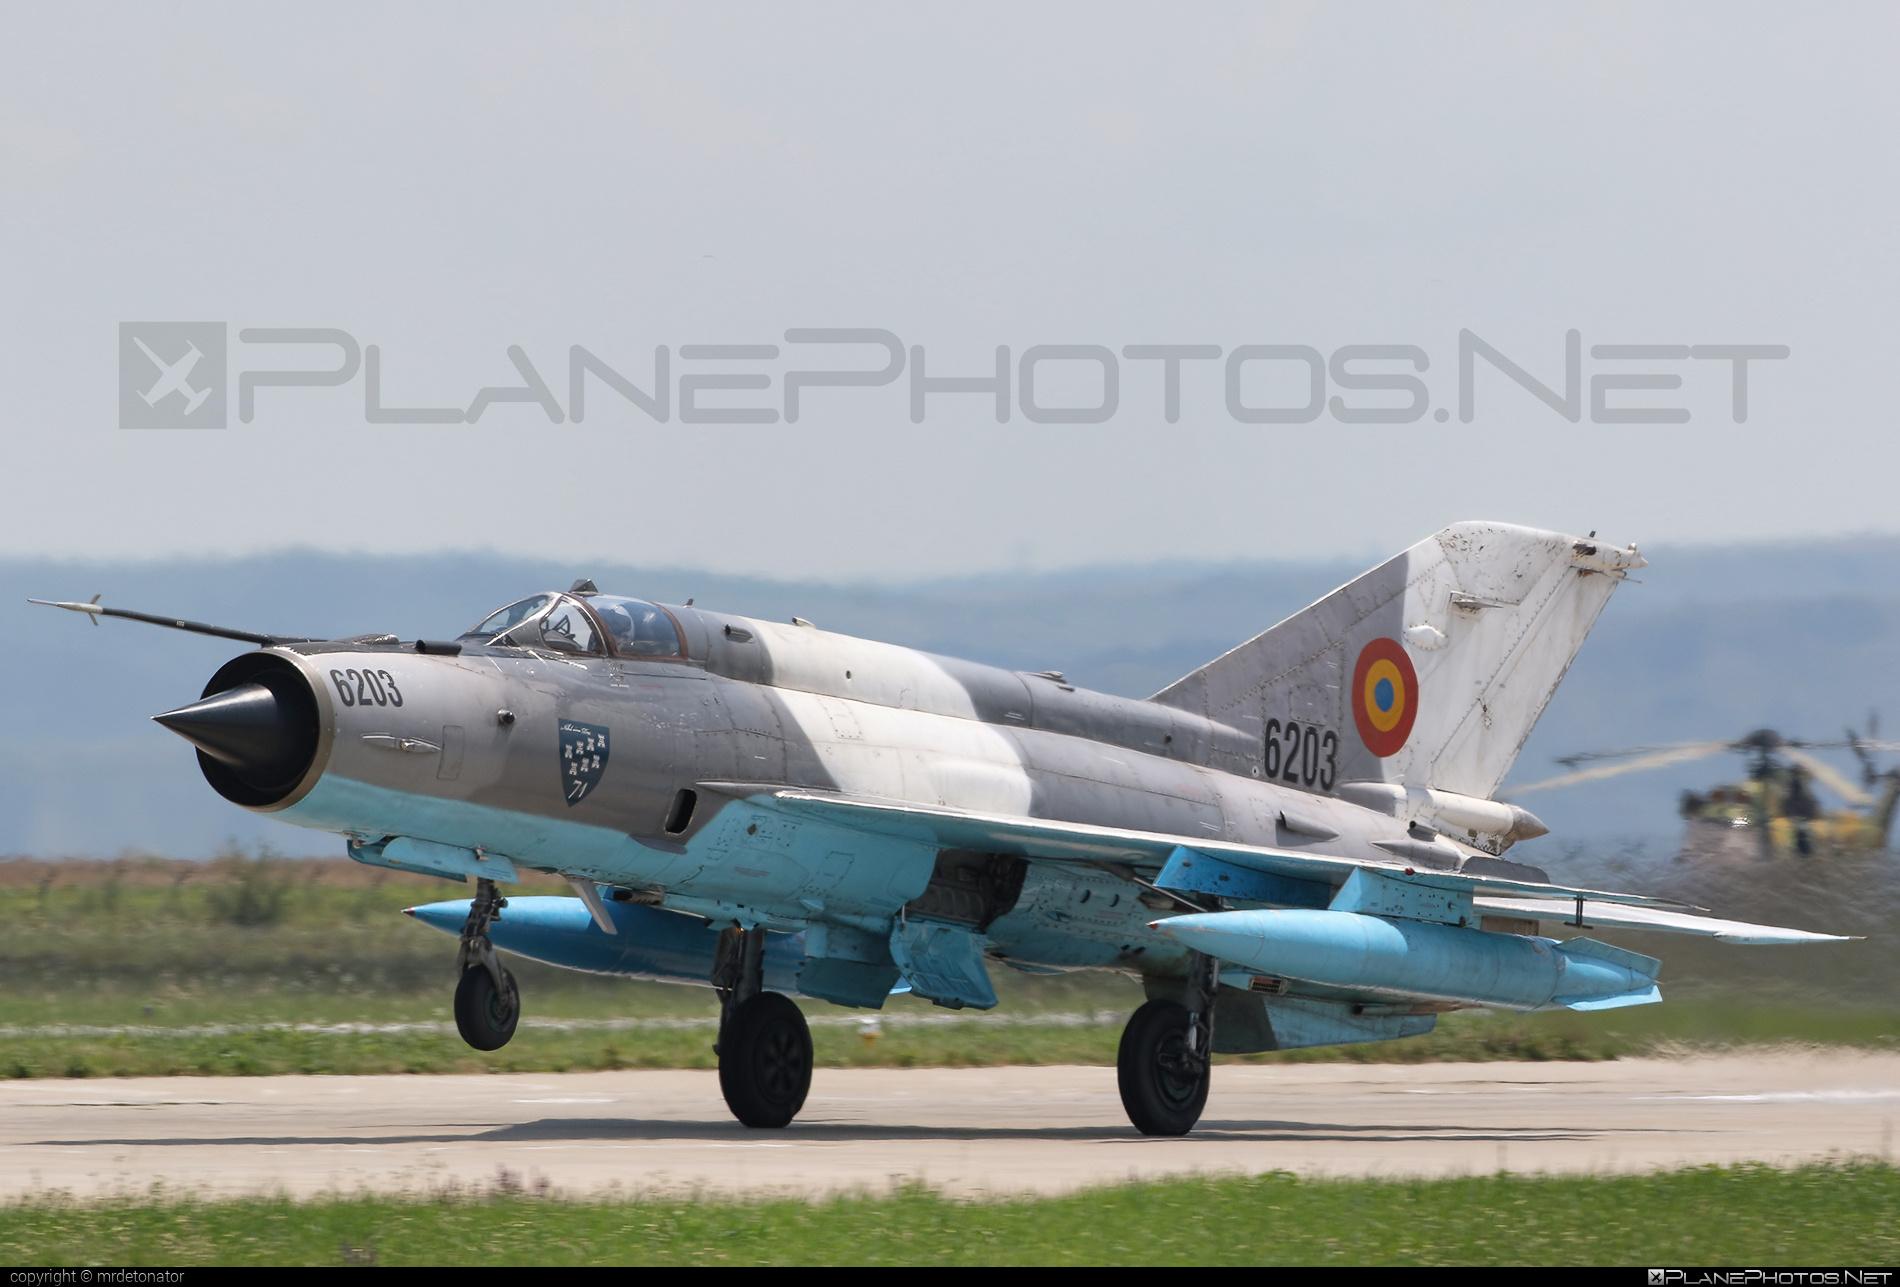 Mikoyan-Gurevich MiG-21MF - 6203 operated by Forţele Aeriene Române (Romanian Air Force) #forteleaerieneromane #mig #mig21 #mig21mf #mikoyangurevich #romanianairforce